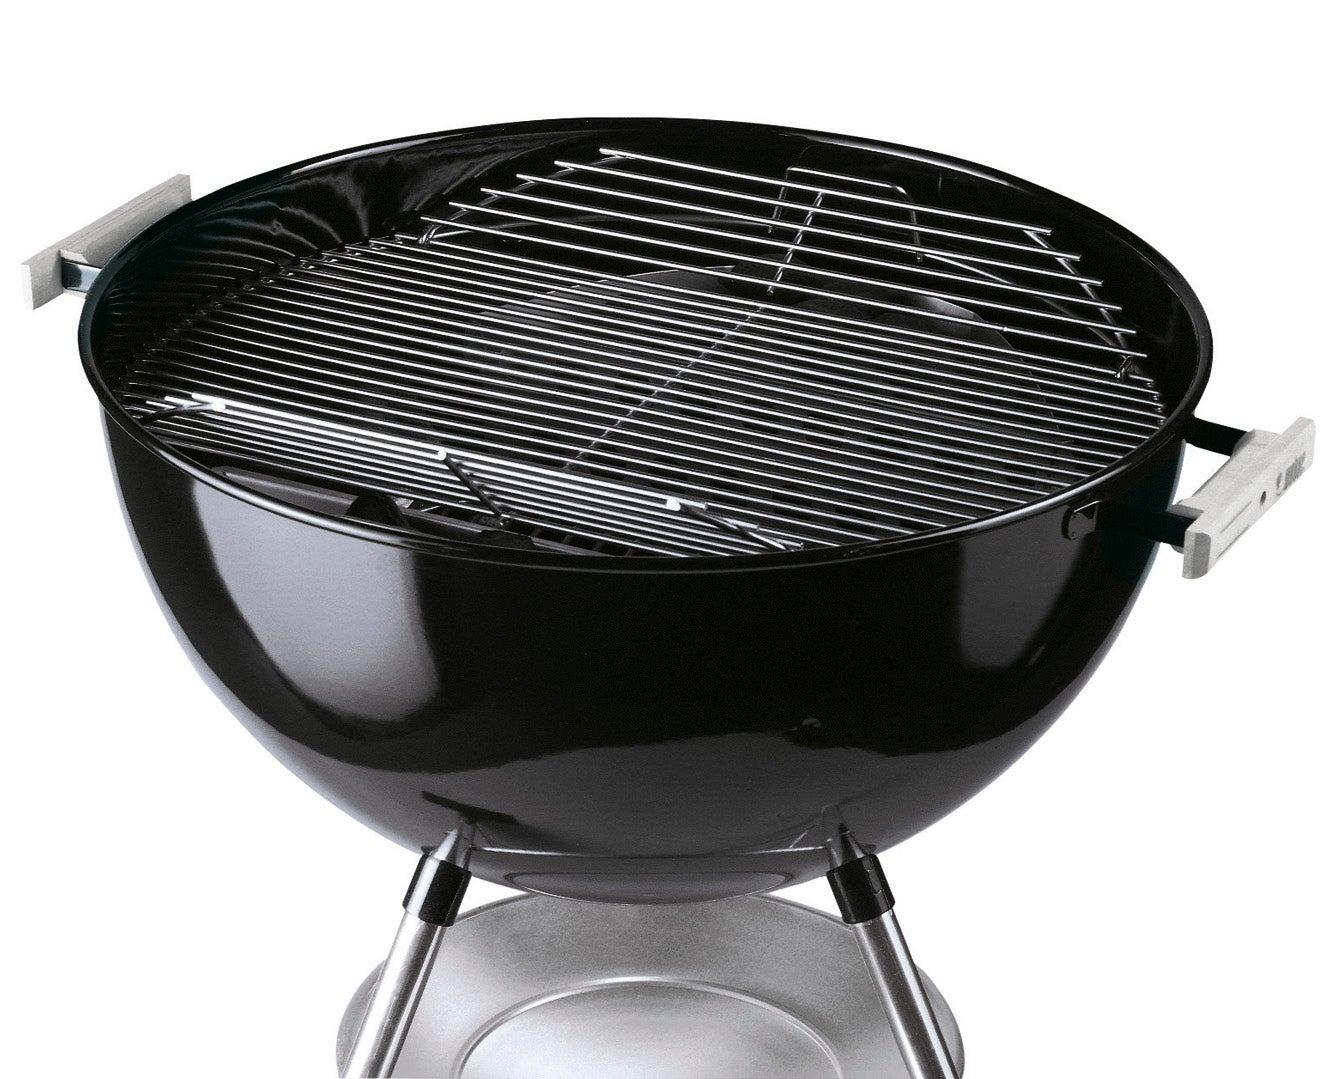 Grille barbecue 46 x 36 cm au meilleur prix | Leroy Merlin